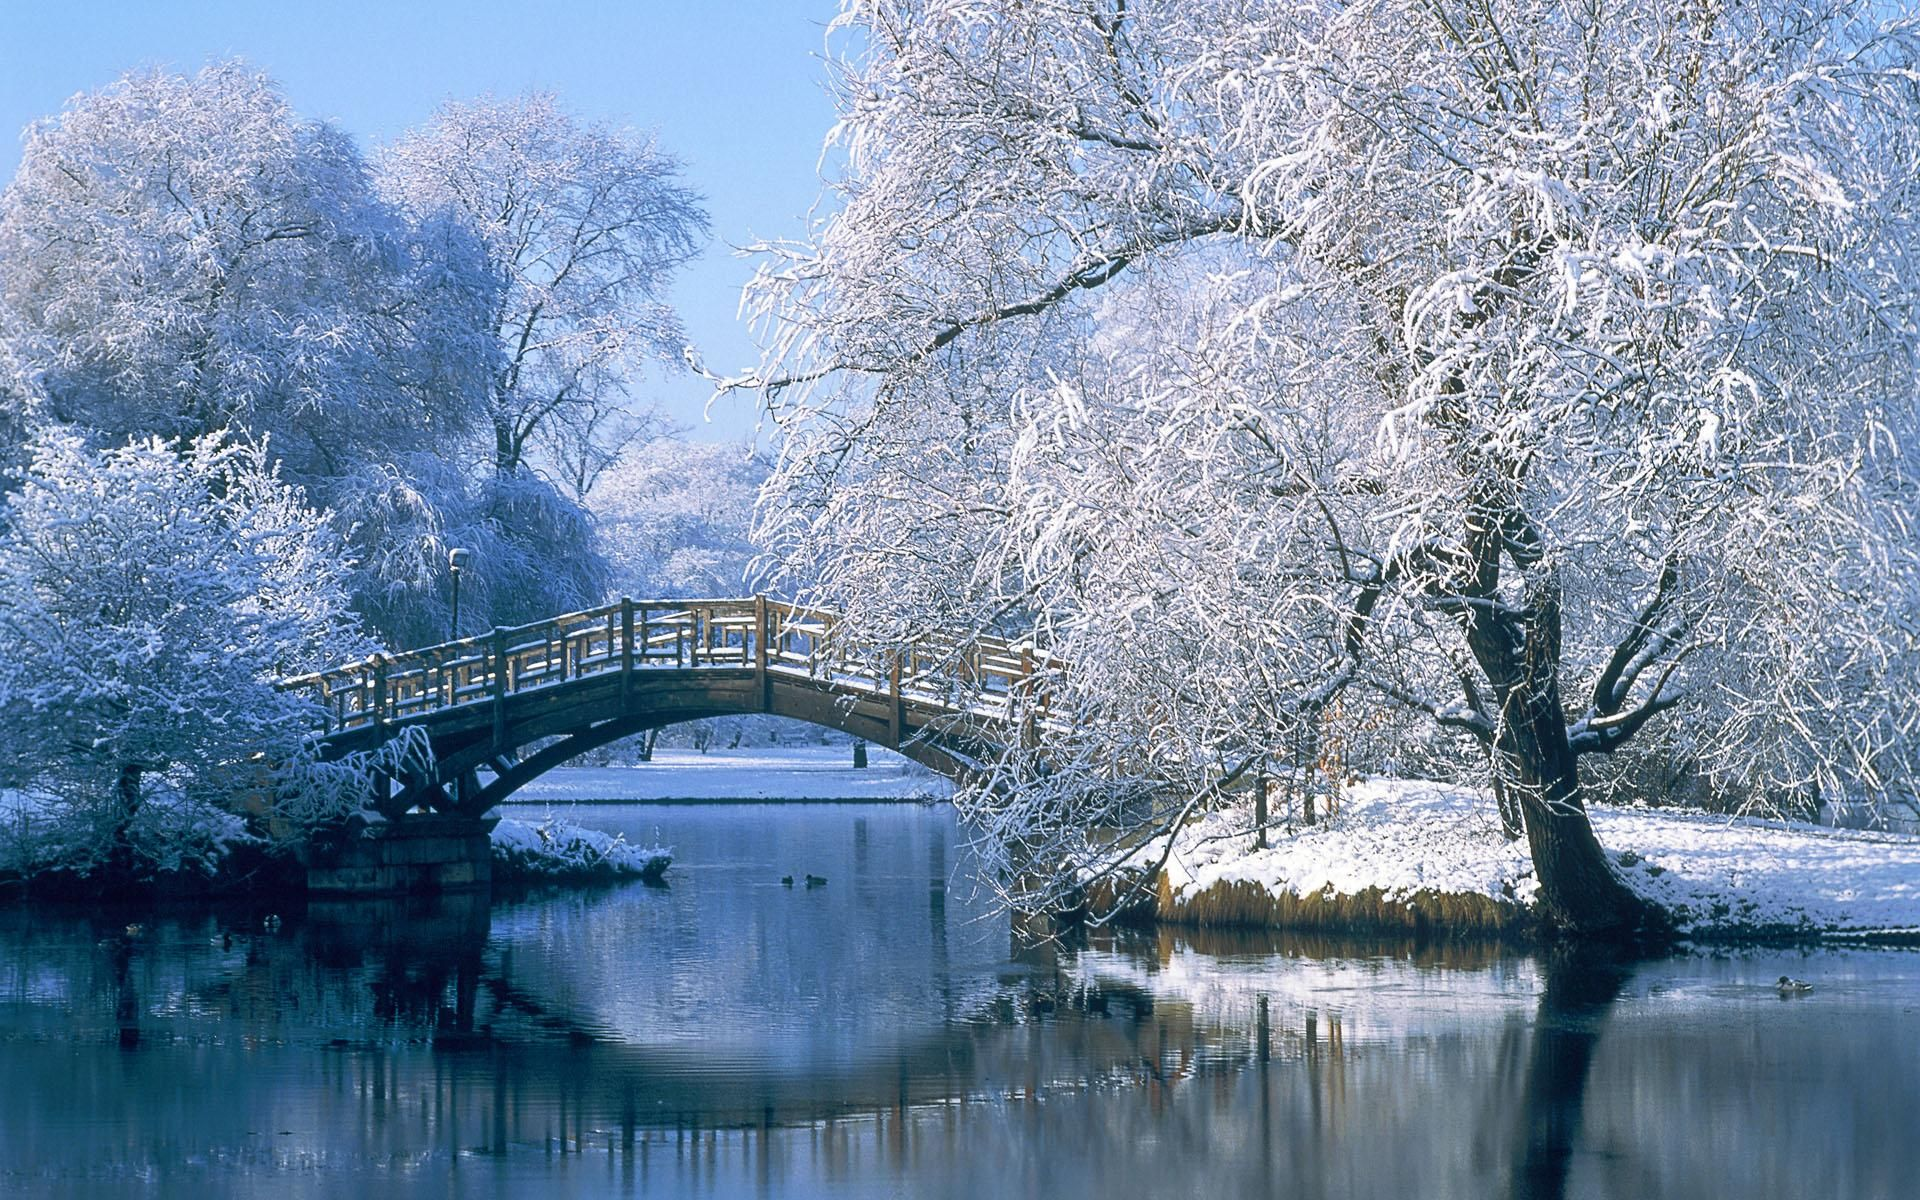 Beautiful Nature Winter Hd Background 9 Hd Wallpapers Fotos De Inverno Cenas De Inverno Papel De Parede Paisagens